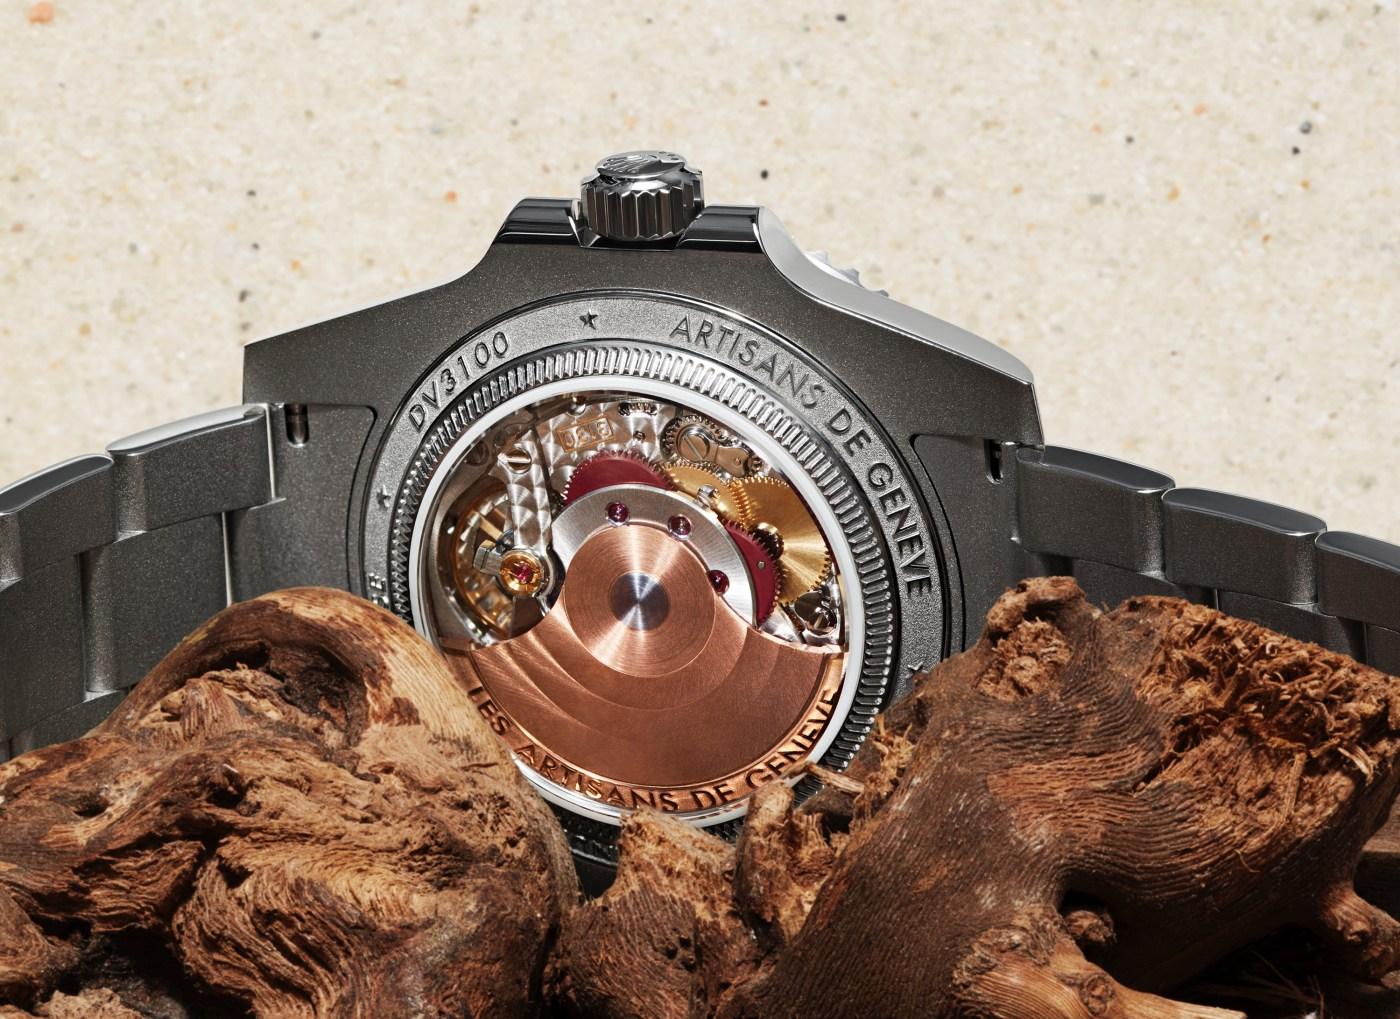 Artisans de Genève Rough Matte Diver caliber 3130 gold rotor